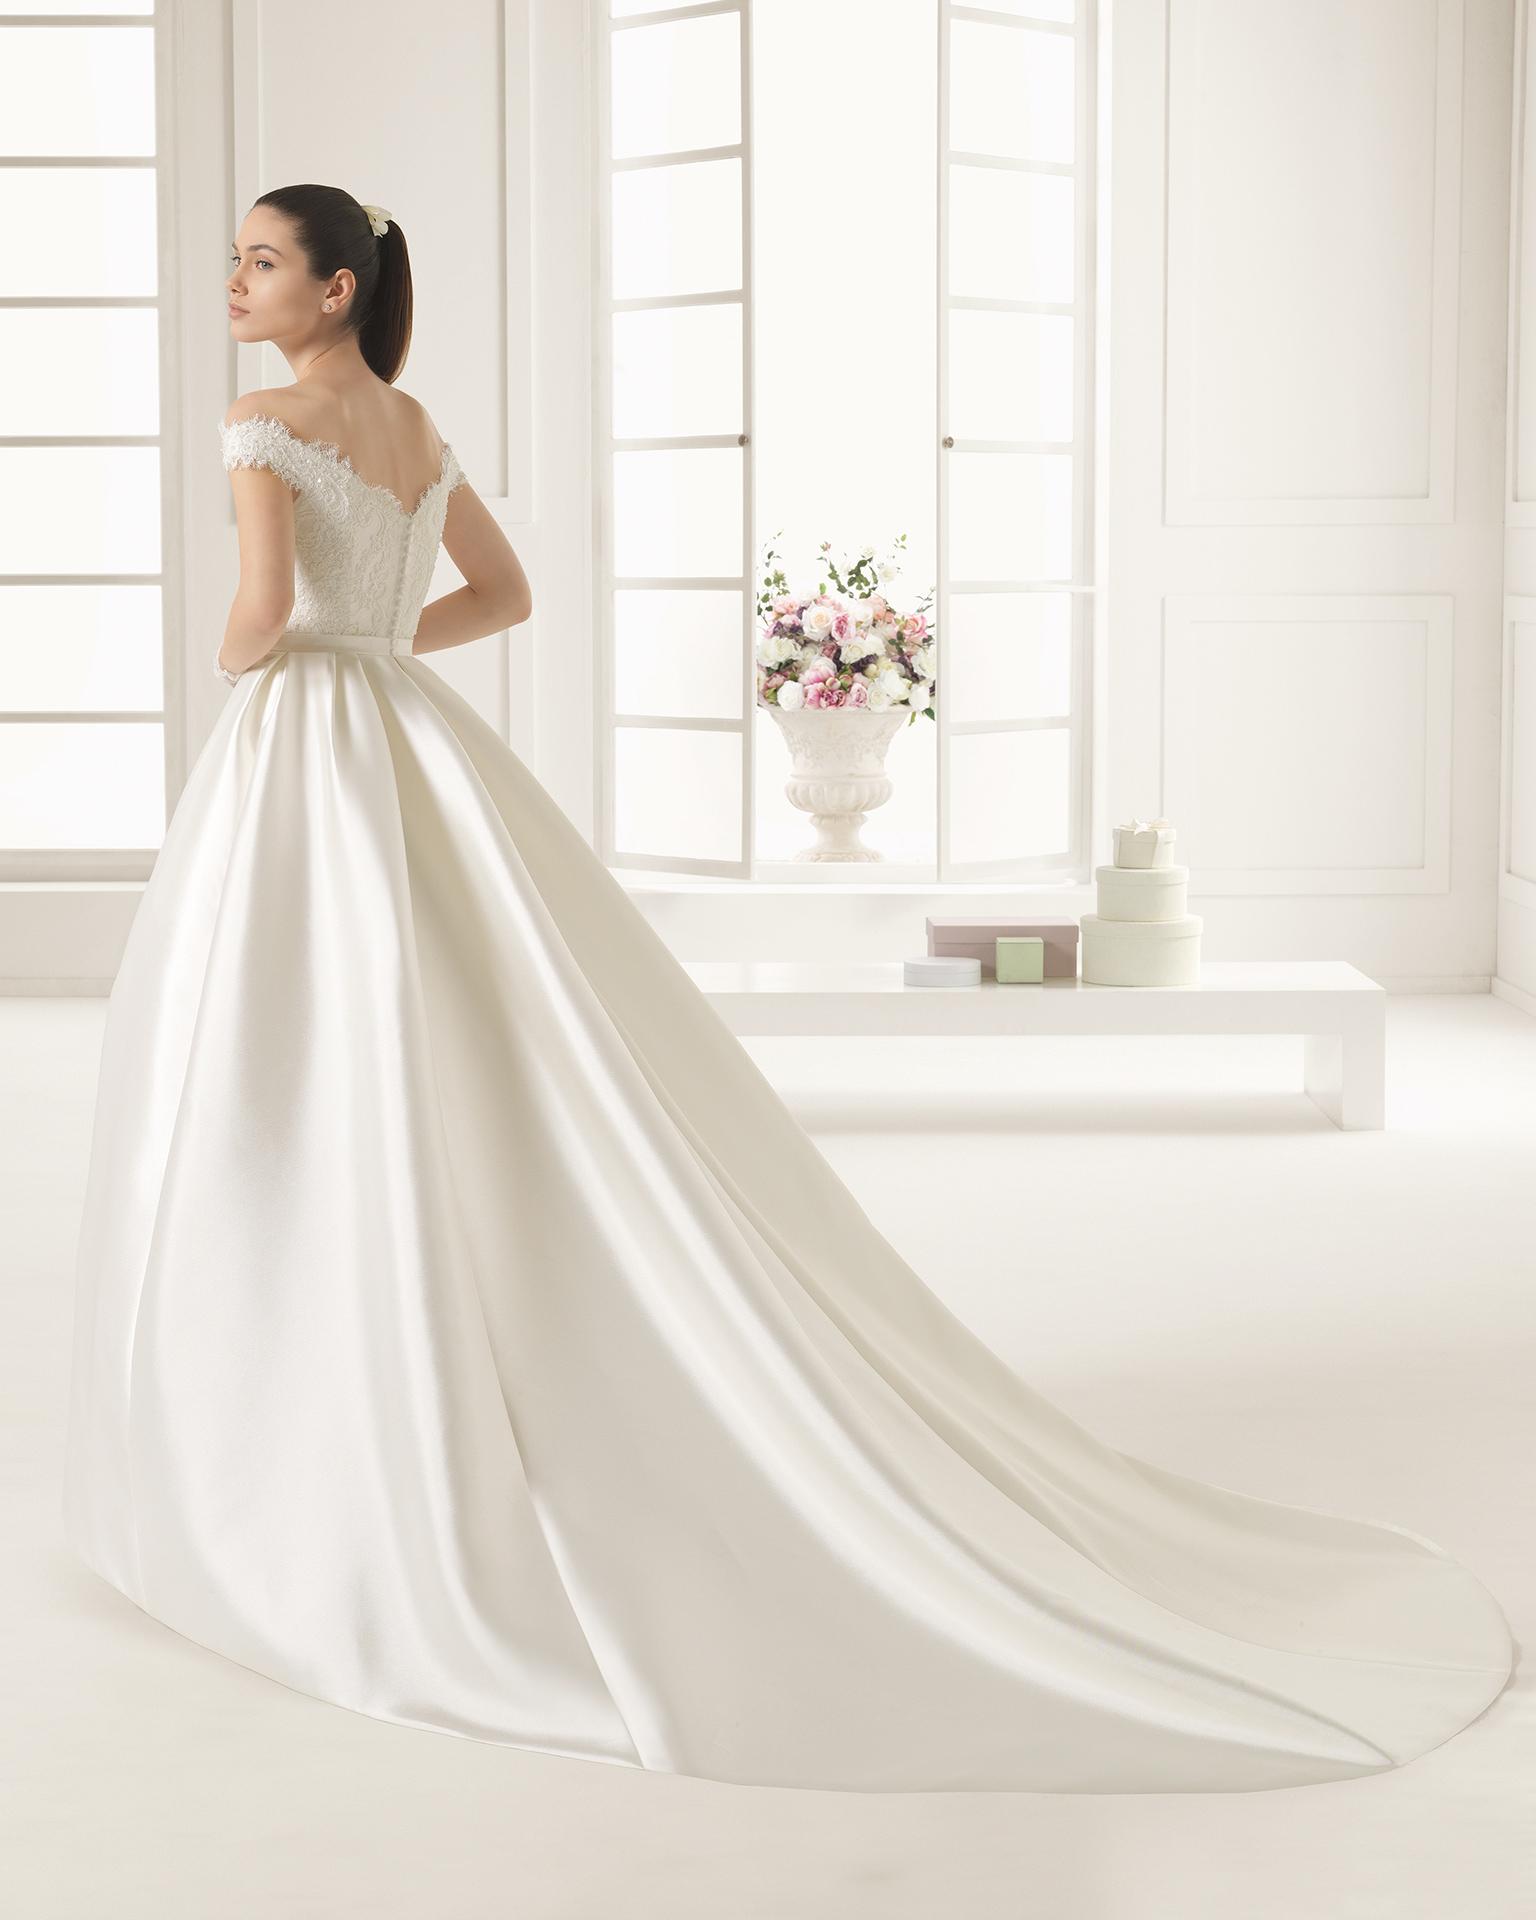 Emilia (38, микадо/кружево/бисер, natural) Свадебное платье Rosa Clara в Одессе. Свадебный салон Скоро Свадьба.